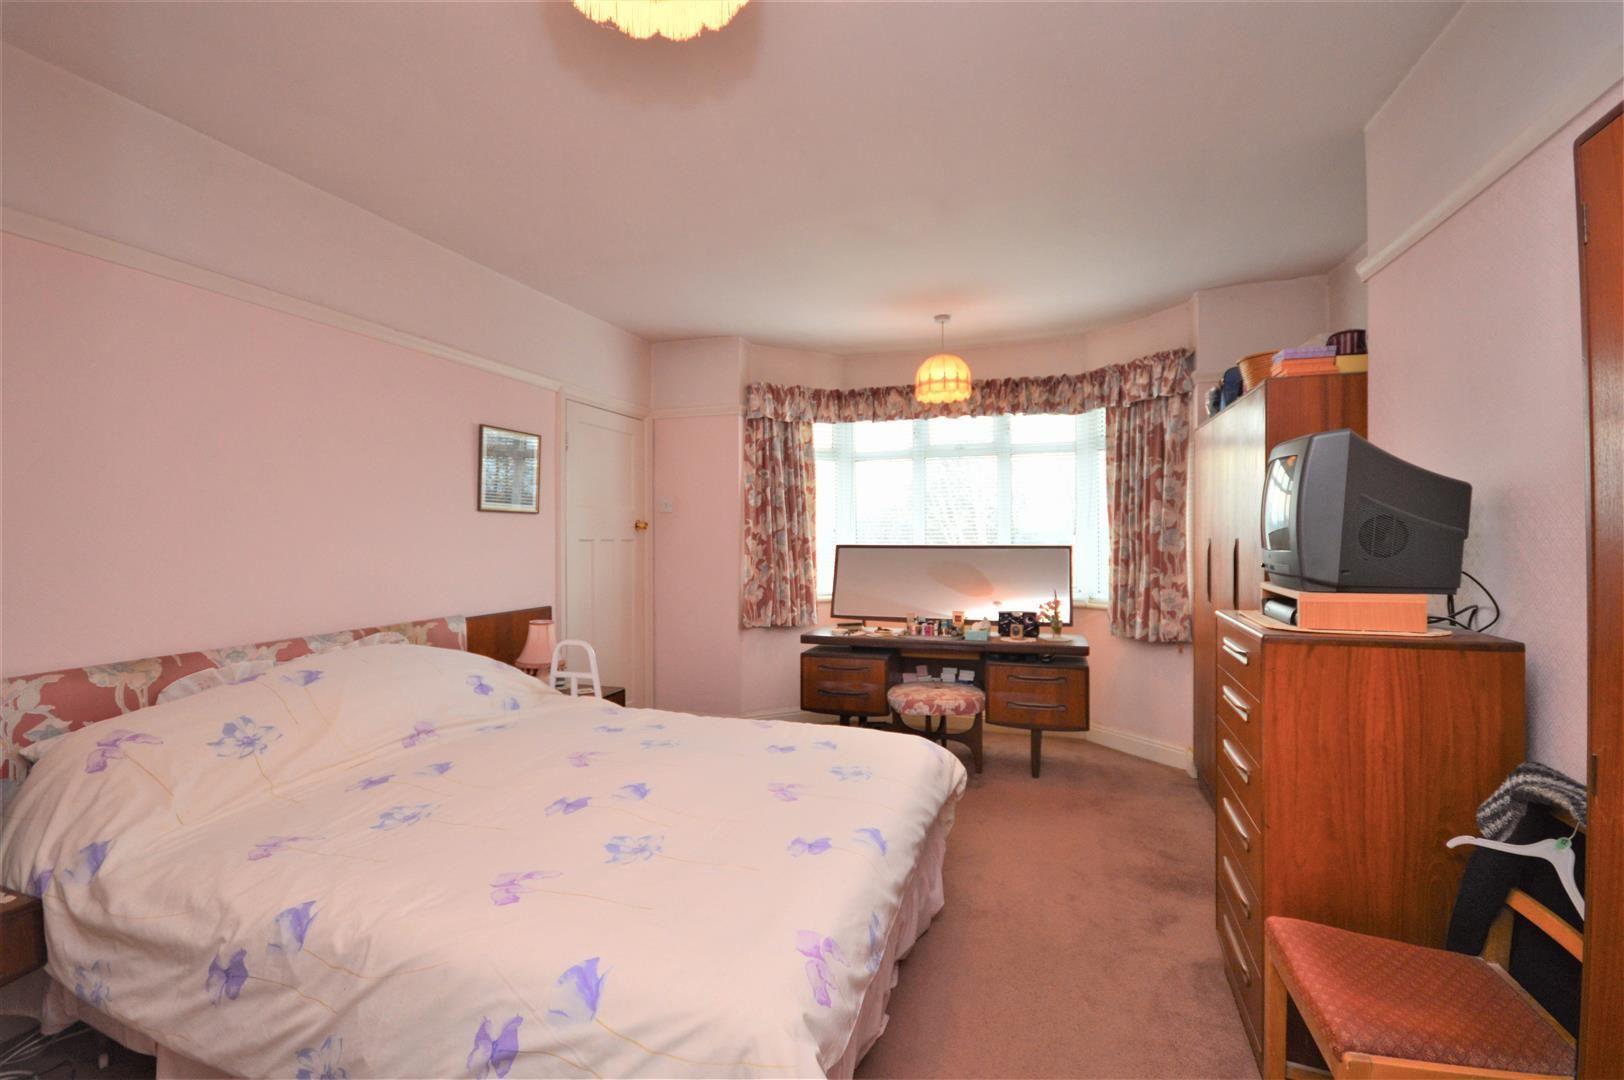 4 bed detached for sale in Bobblestock  - Property Image 12